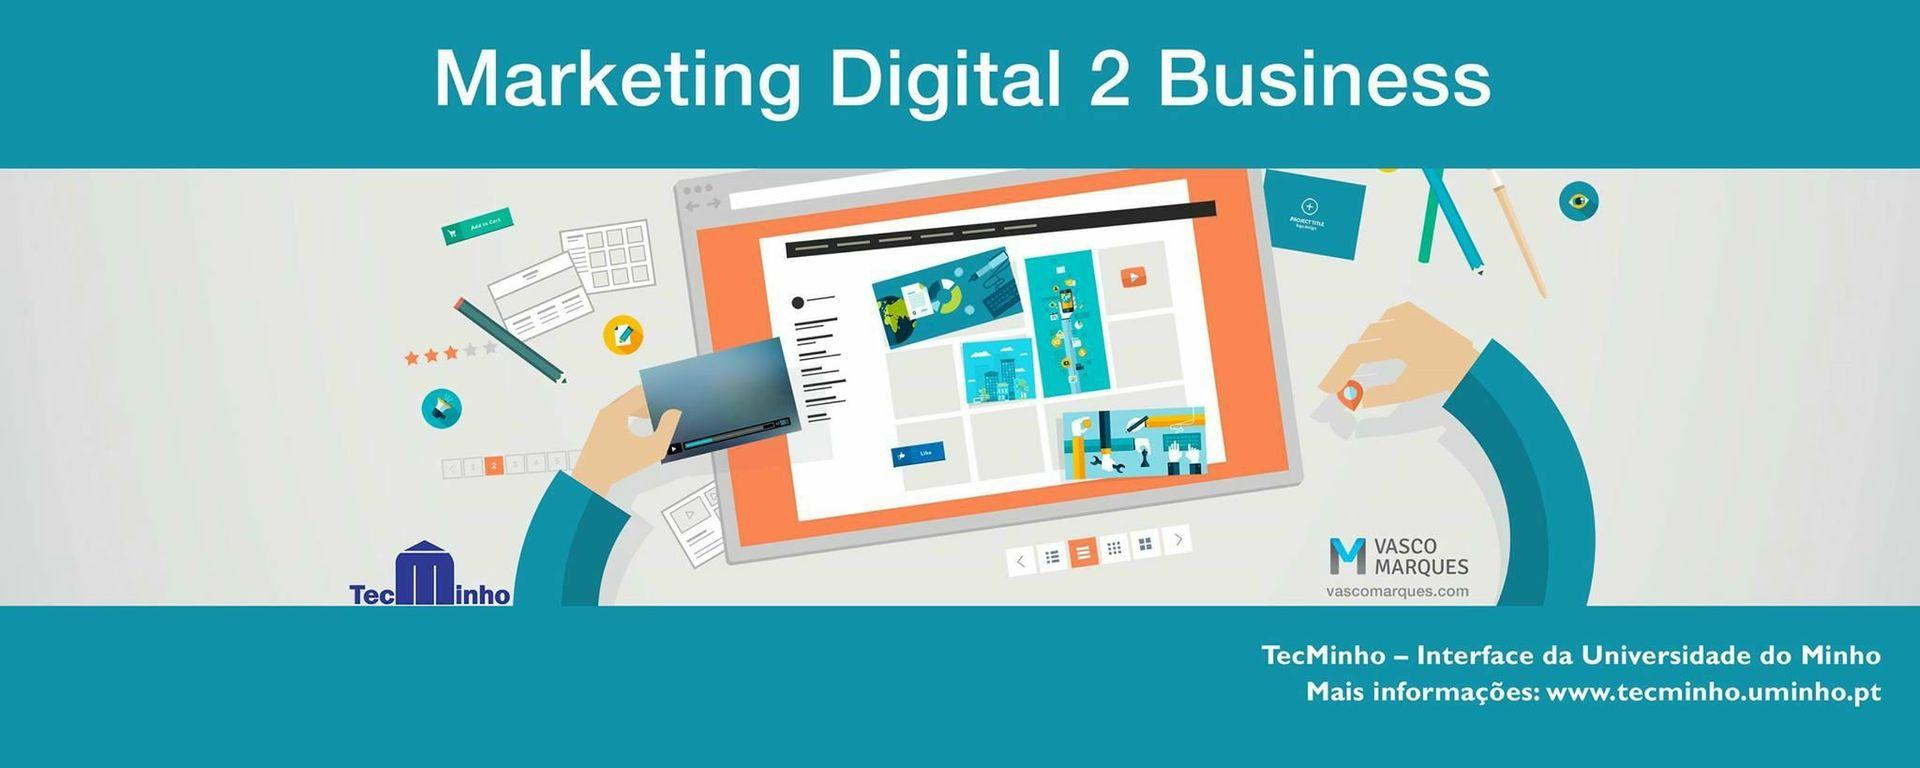 marketing-digital-2-business-digital-marketing